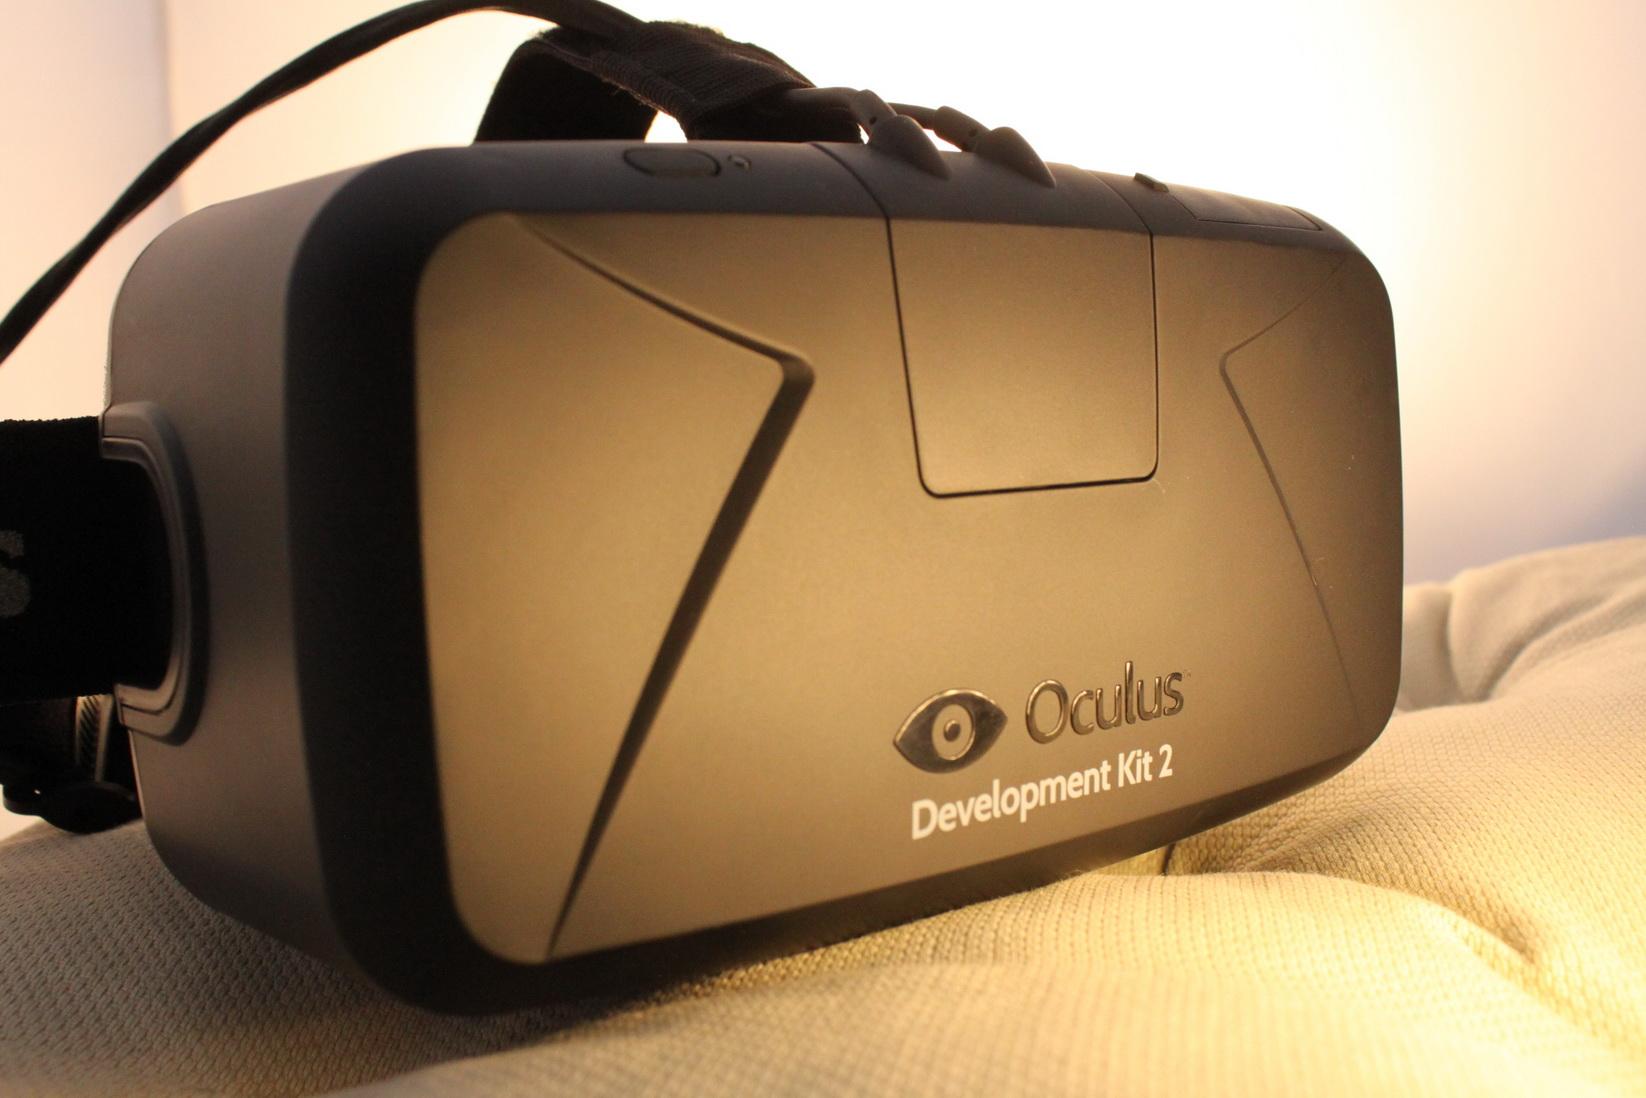 OculusRiftDK2 Gameblog 236